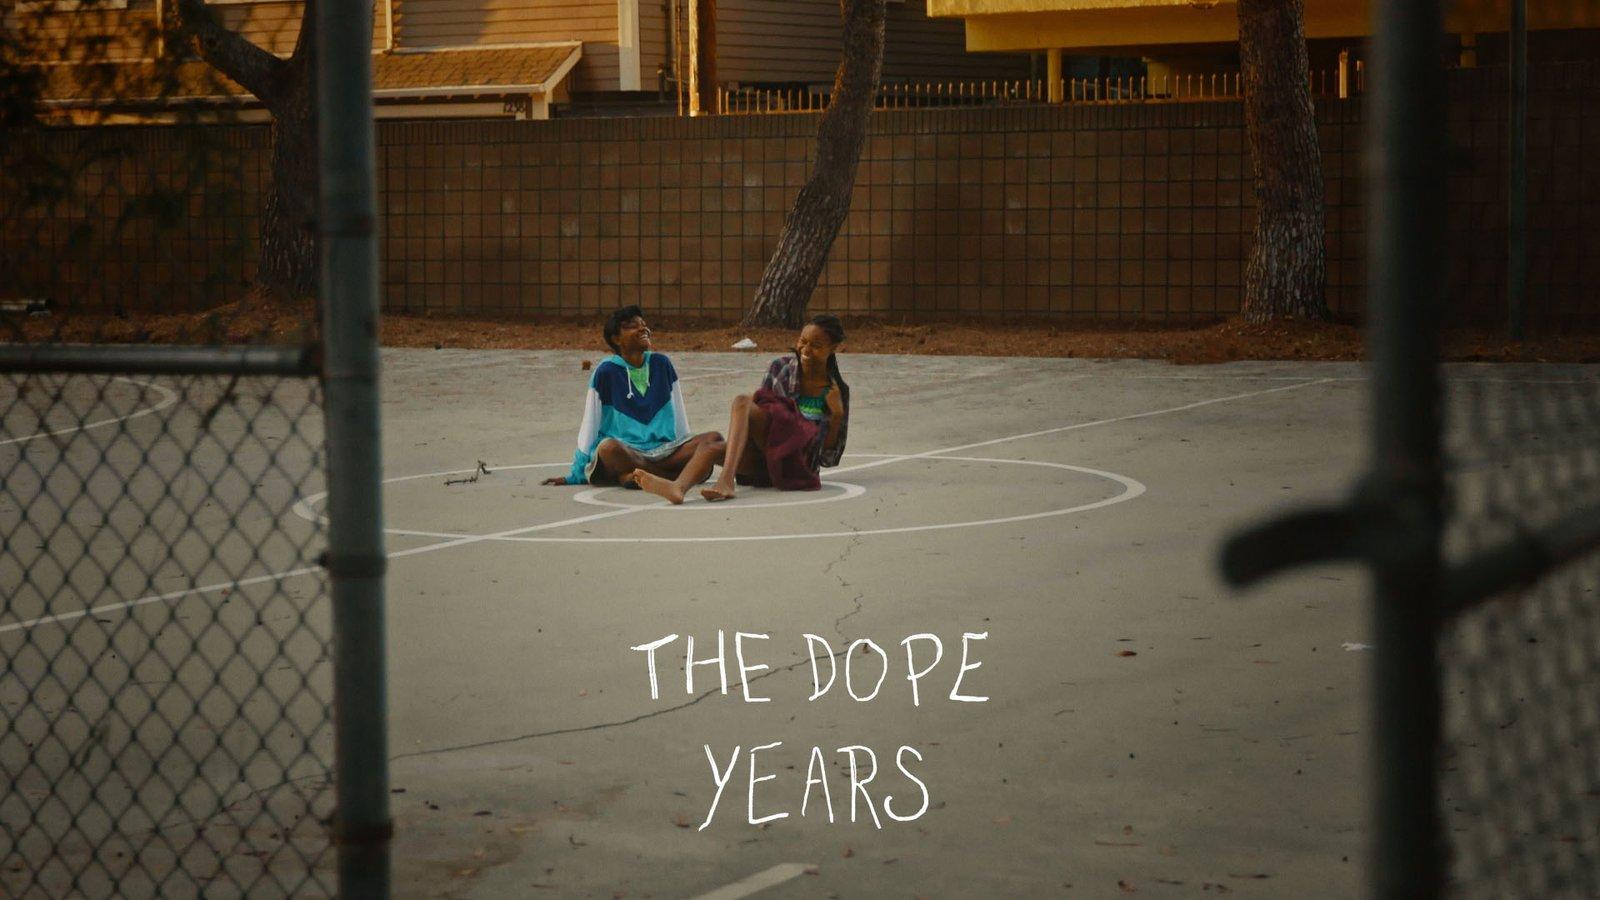 The Dope Years - The Story of Latasha Harlins